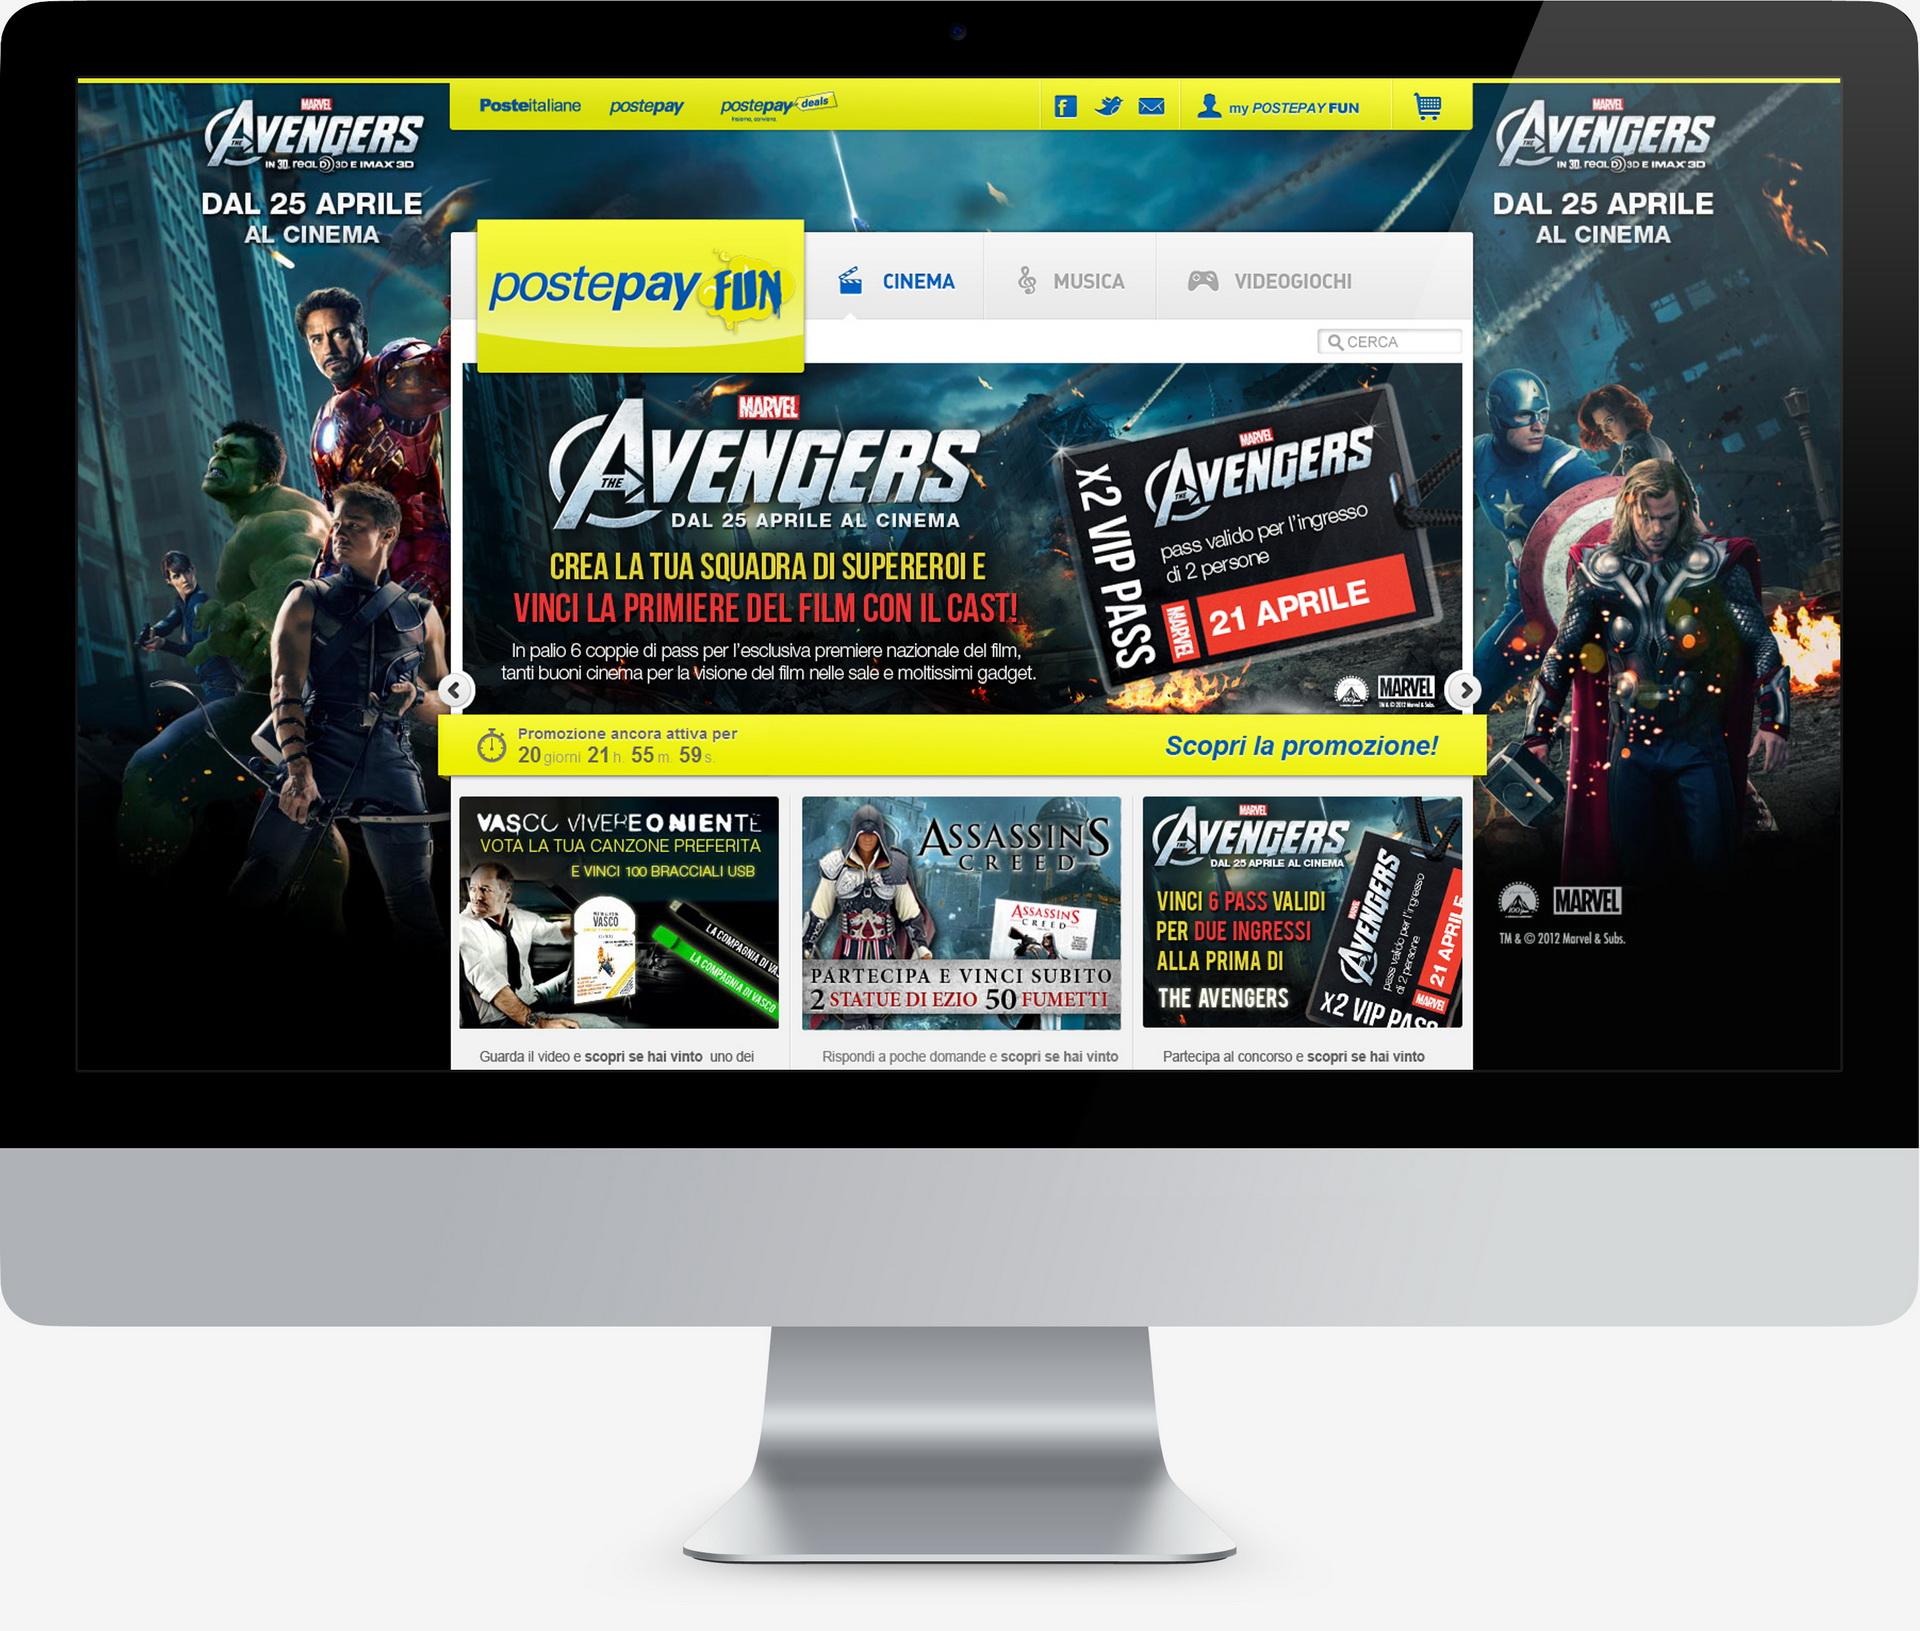 promo-theAvengers